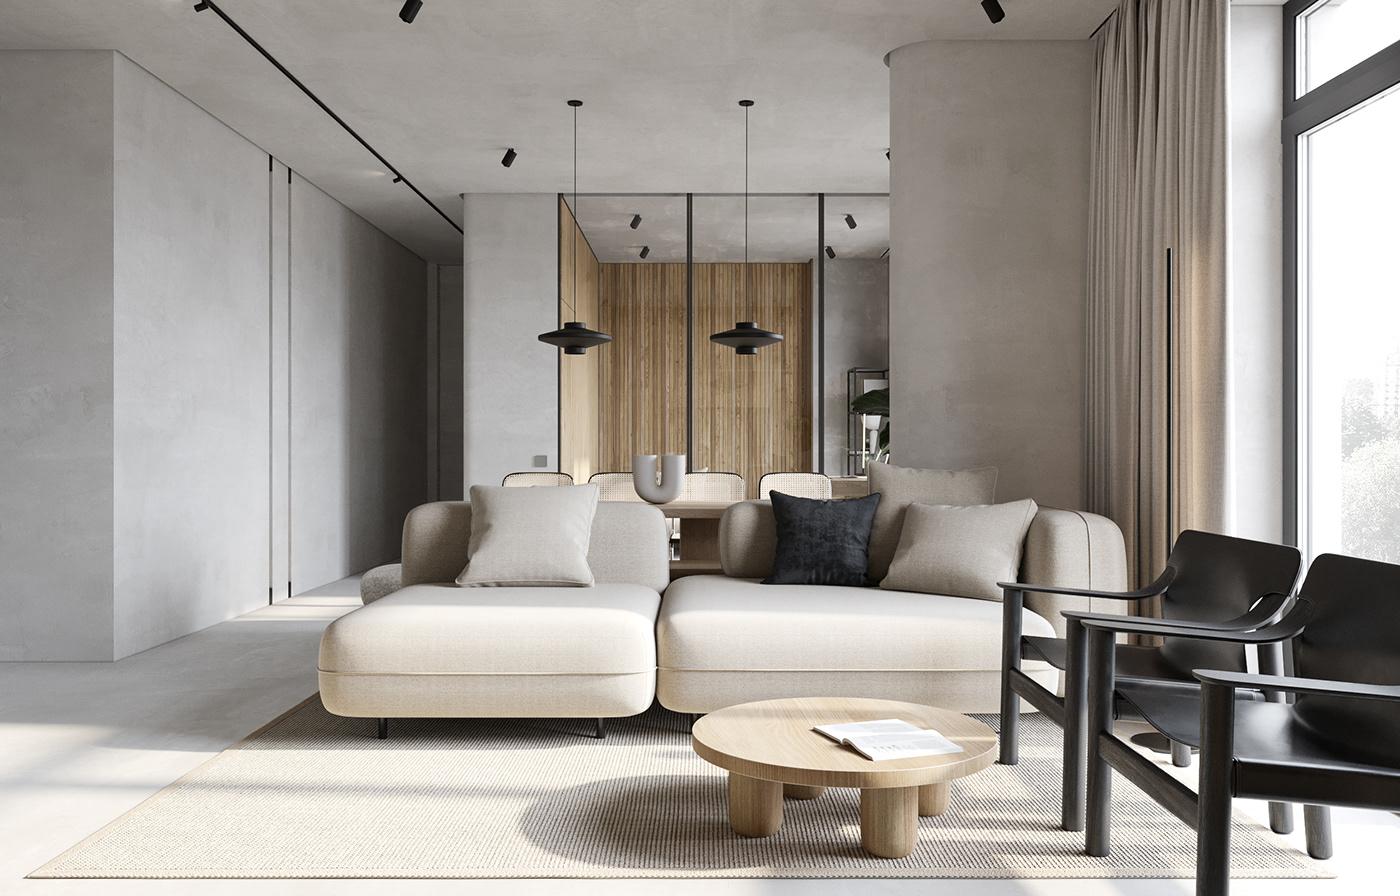 apartments cream flat Interior microcement rattan